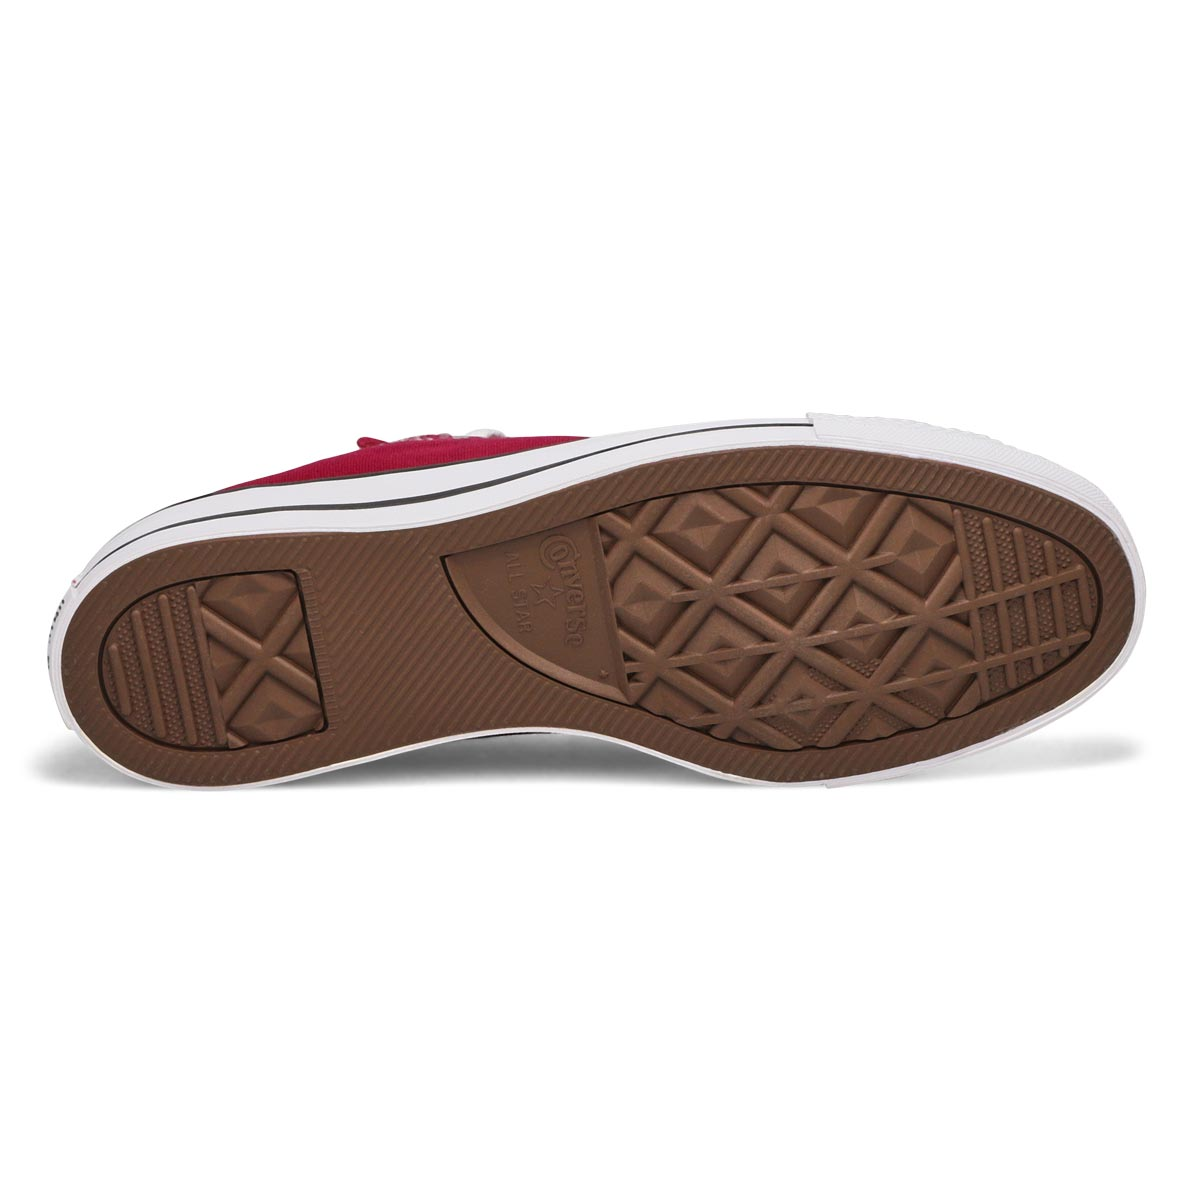 Men's Chuck Taylor All Star Core Sneaker - Maroon